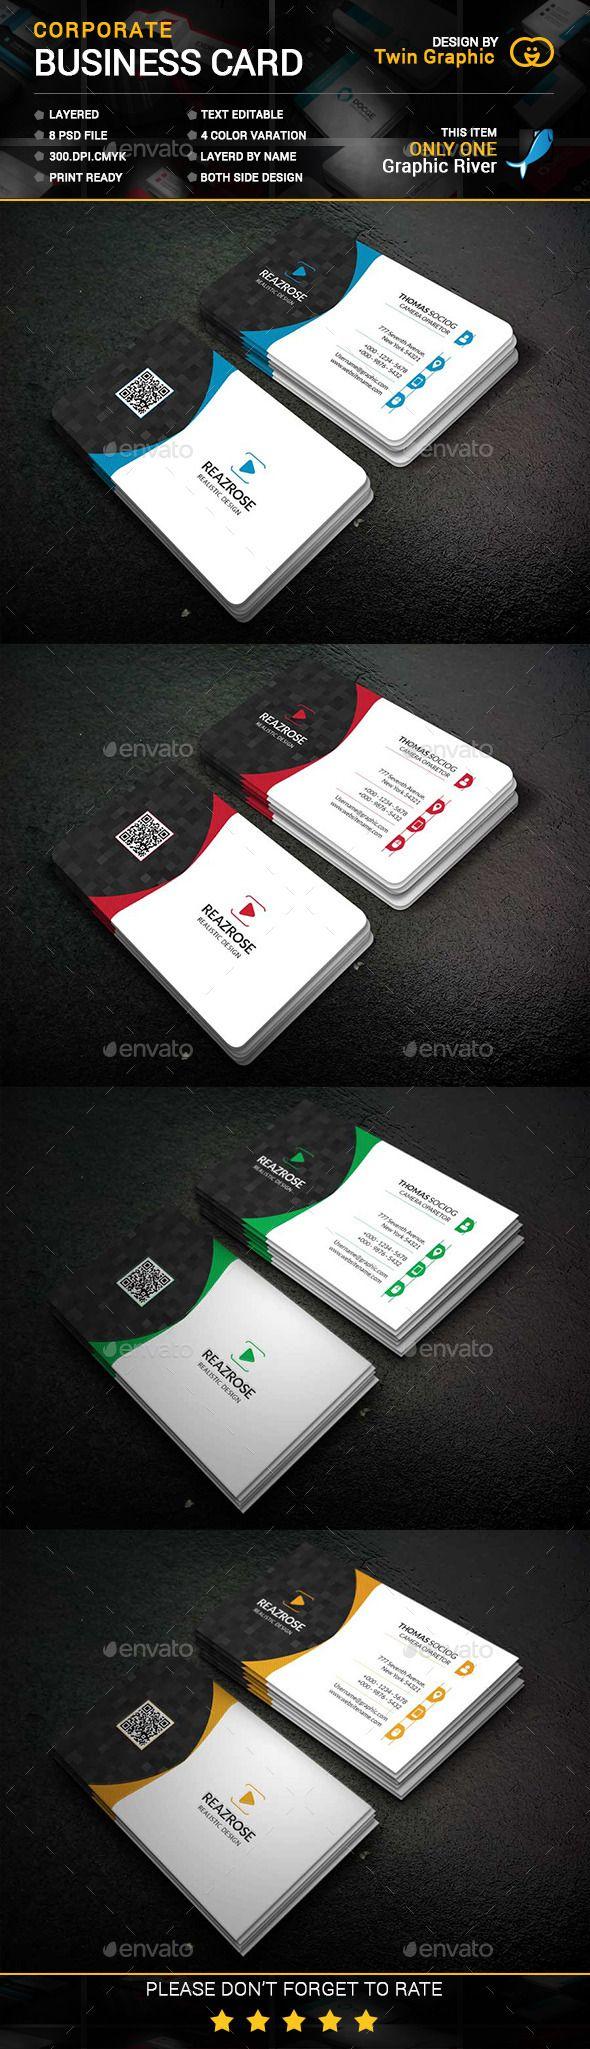 116 best Business card images on Pinterest | Visit cards, Print ...